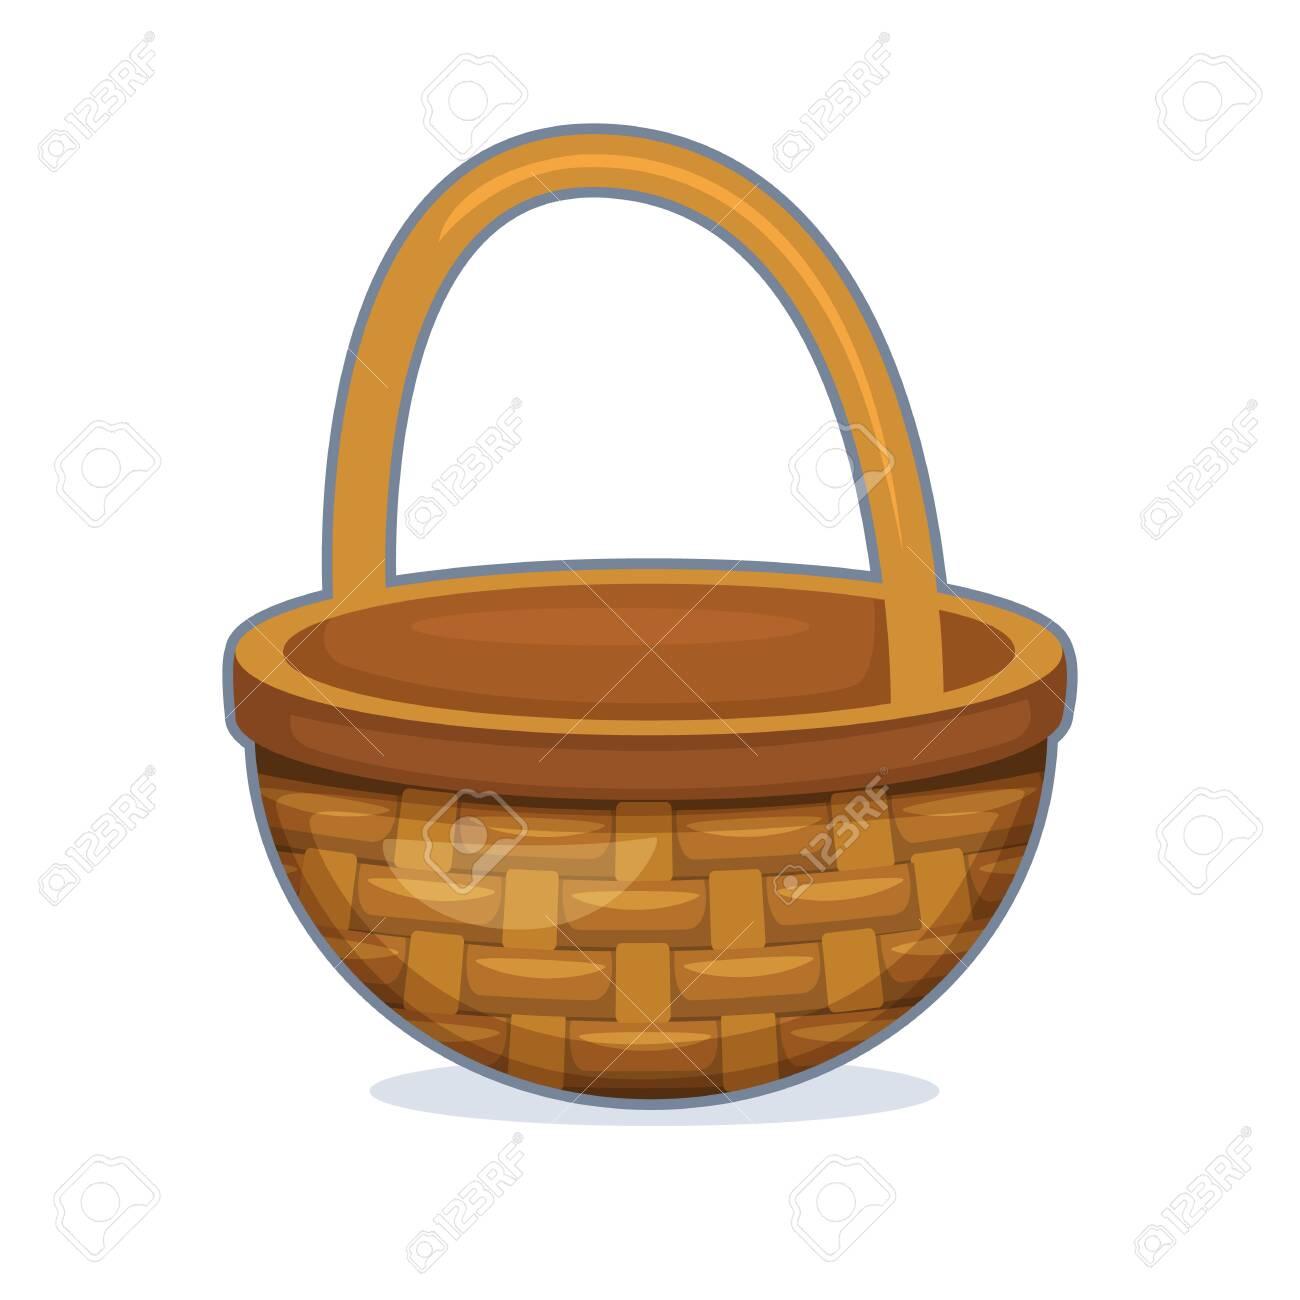 Vector illustration of wicker basket on white background - 130346665